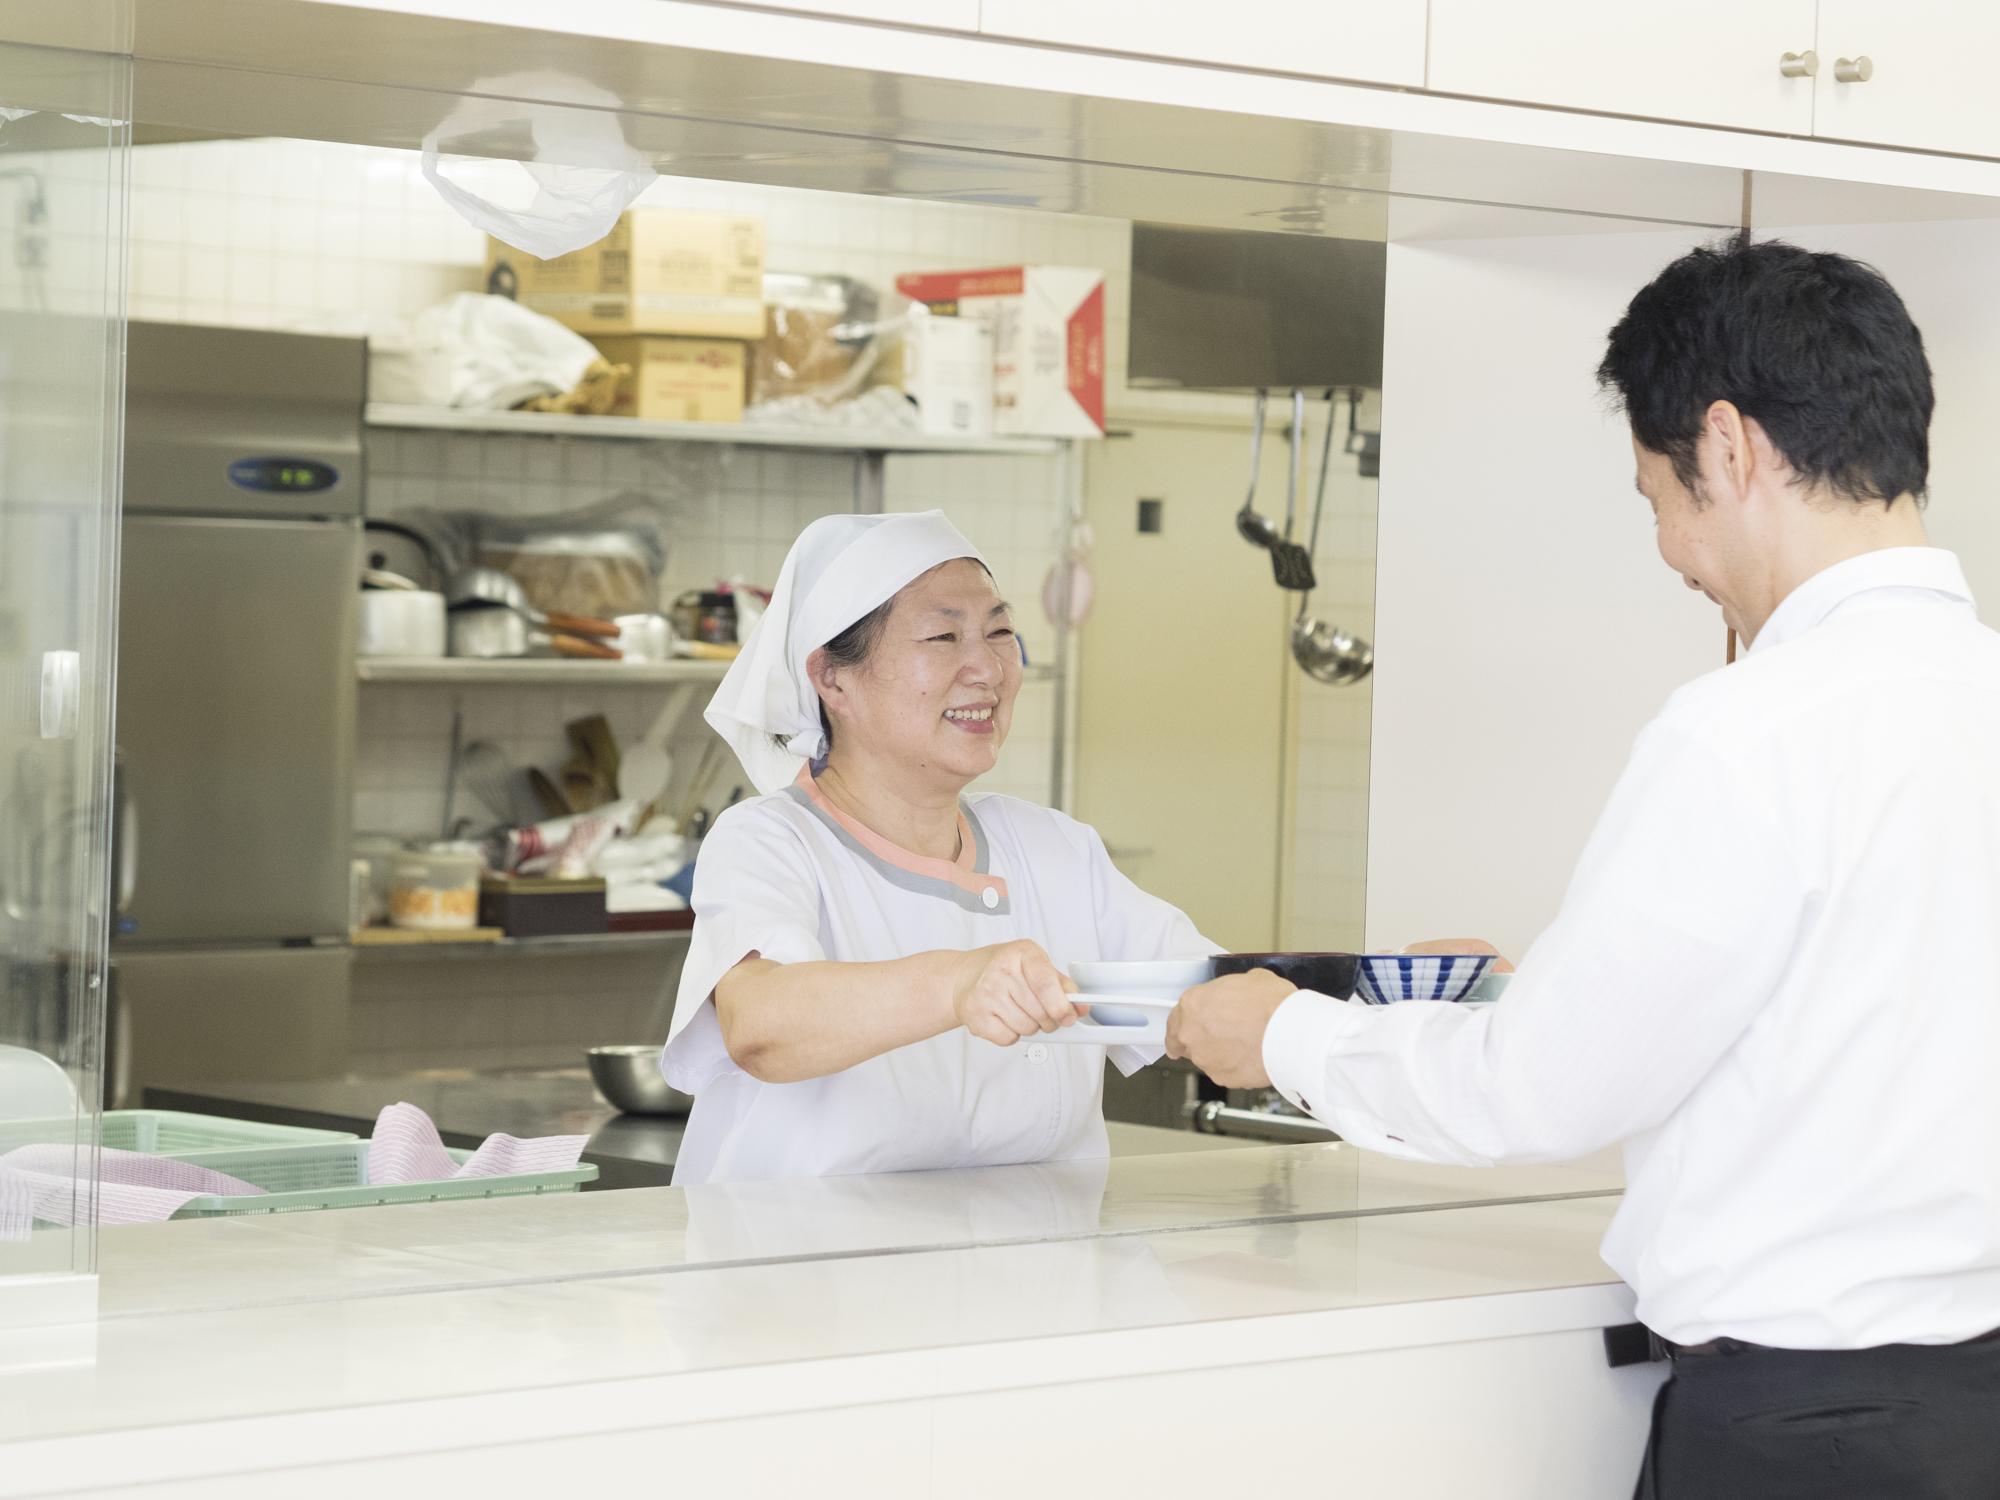 学生寮・独身寮・学生食堂・社員食堂のお仕事